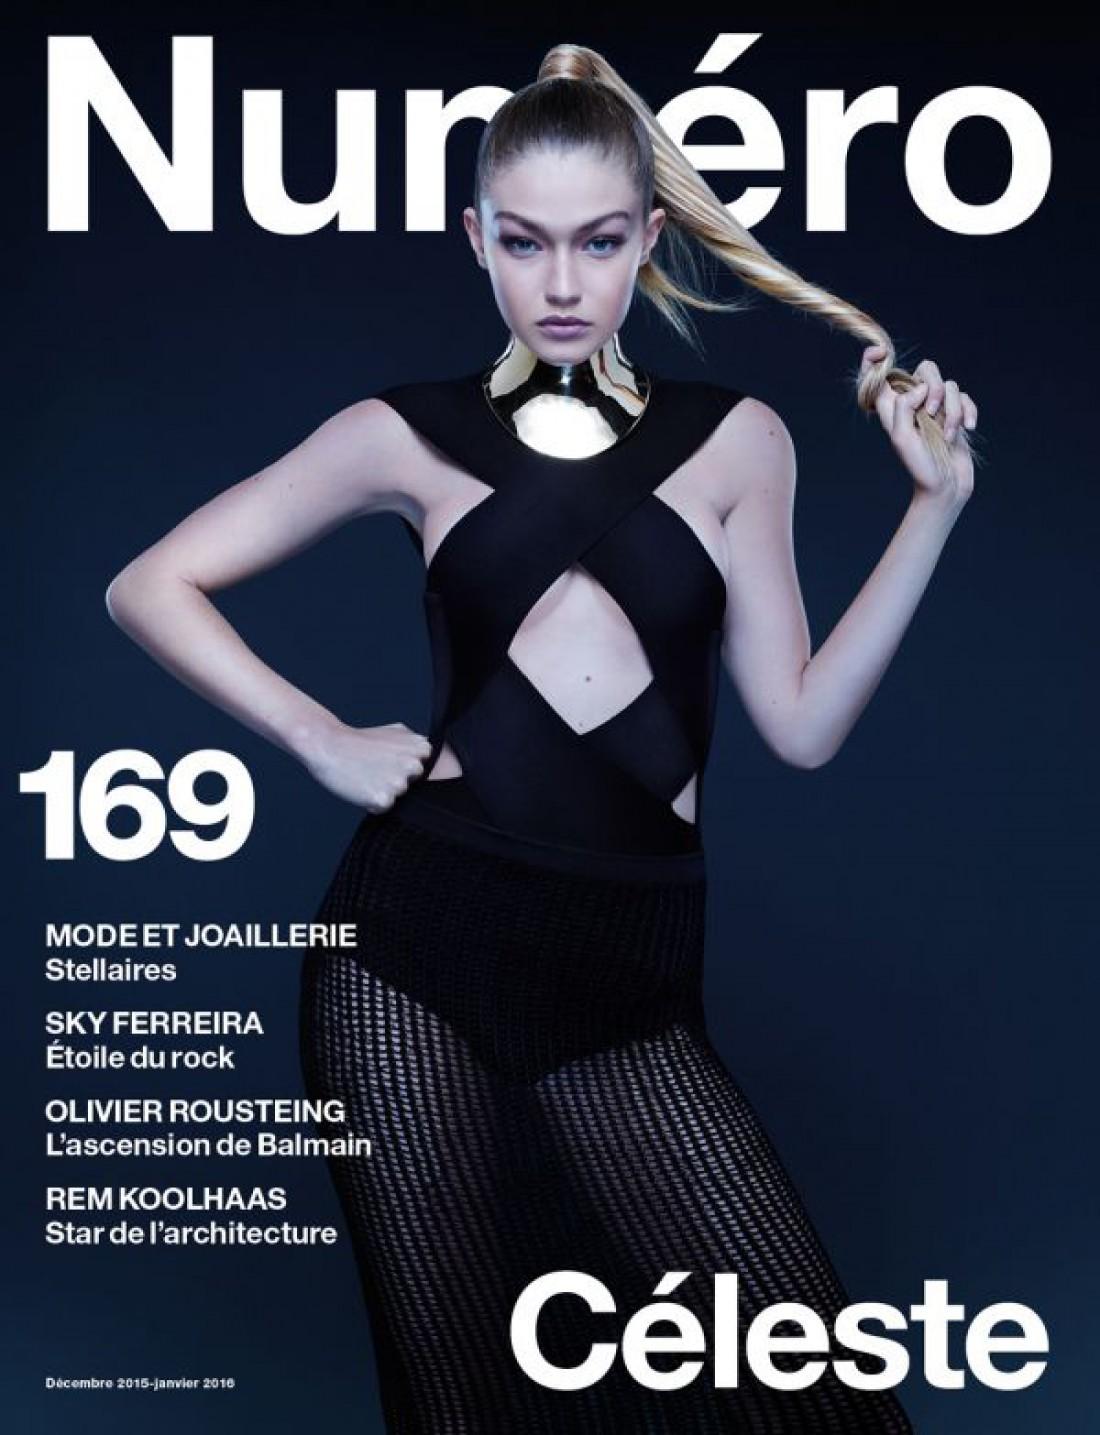 Джиджи Хадид снялась для обложки Numero